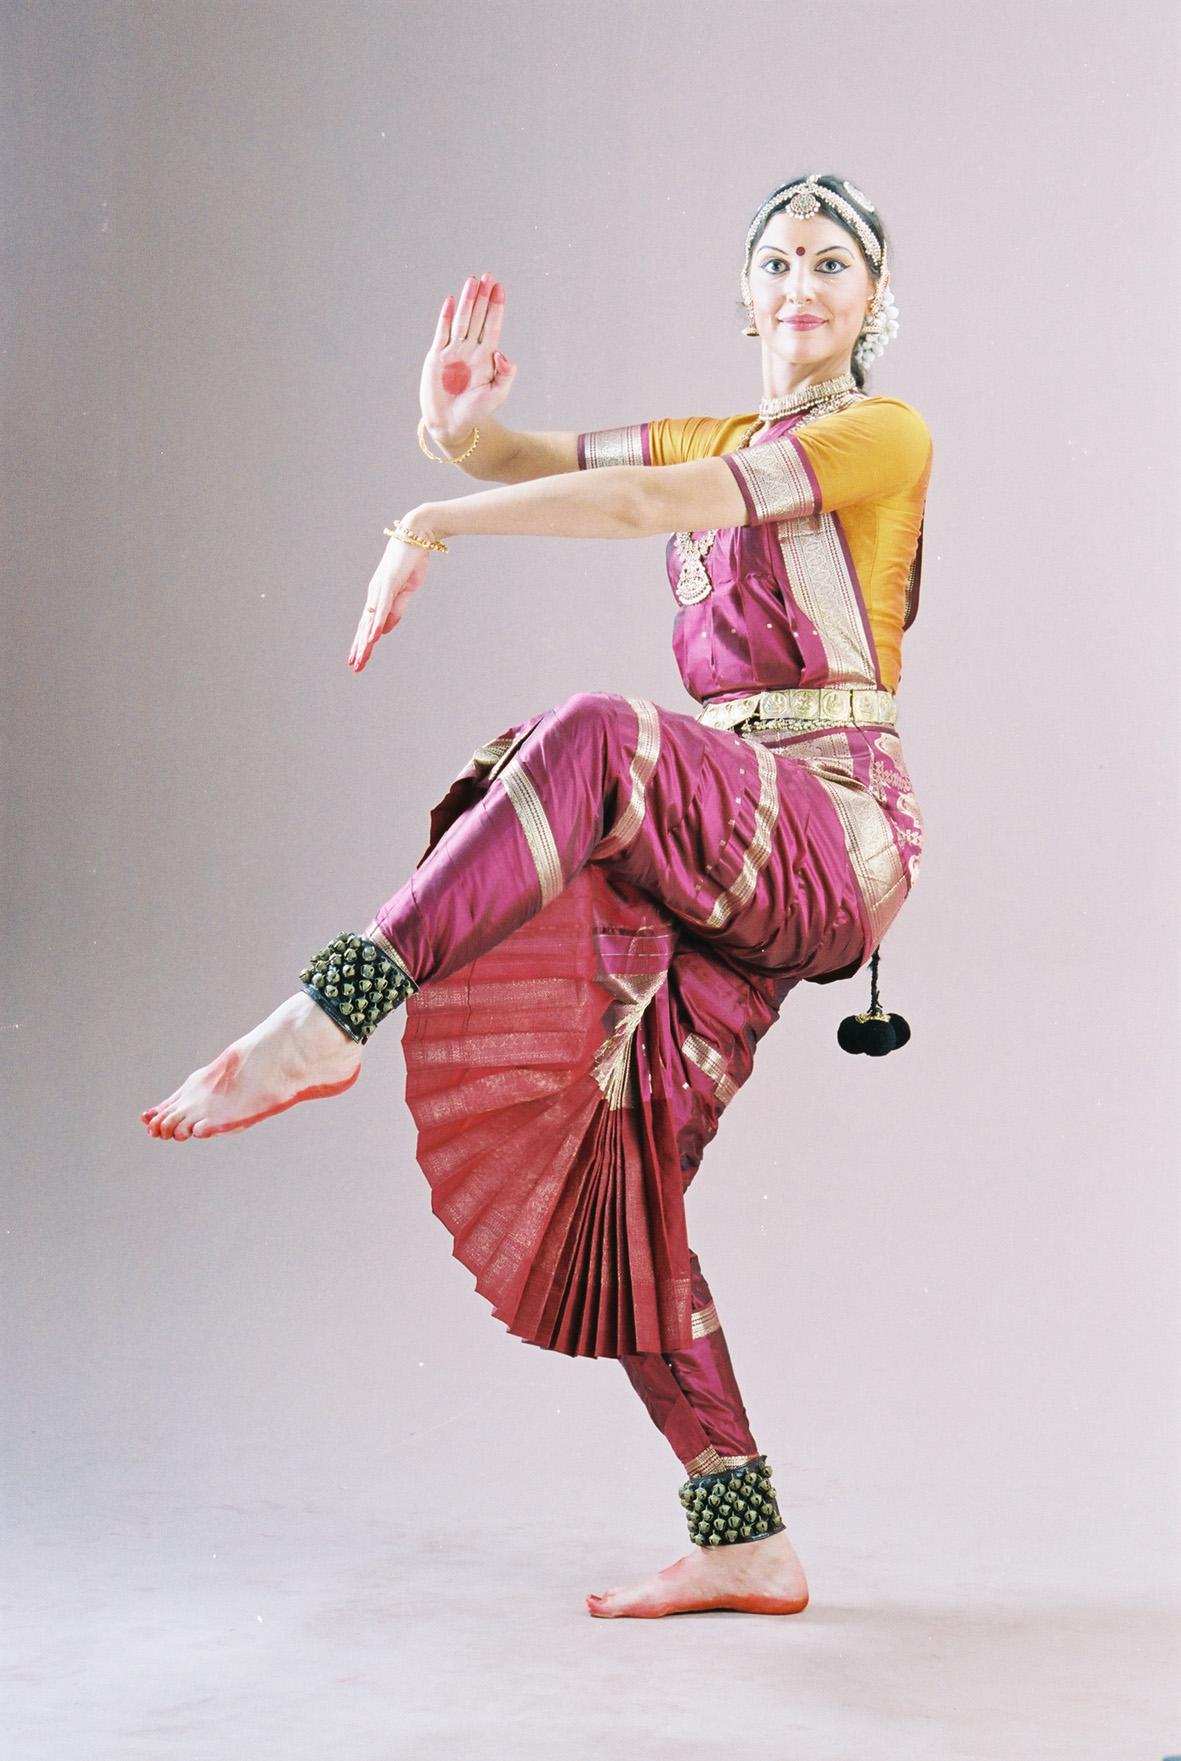 Chandra Devi